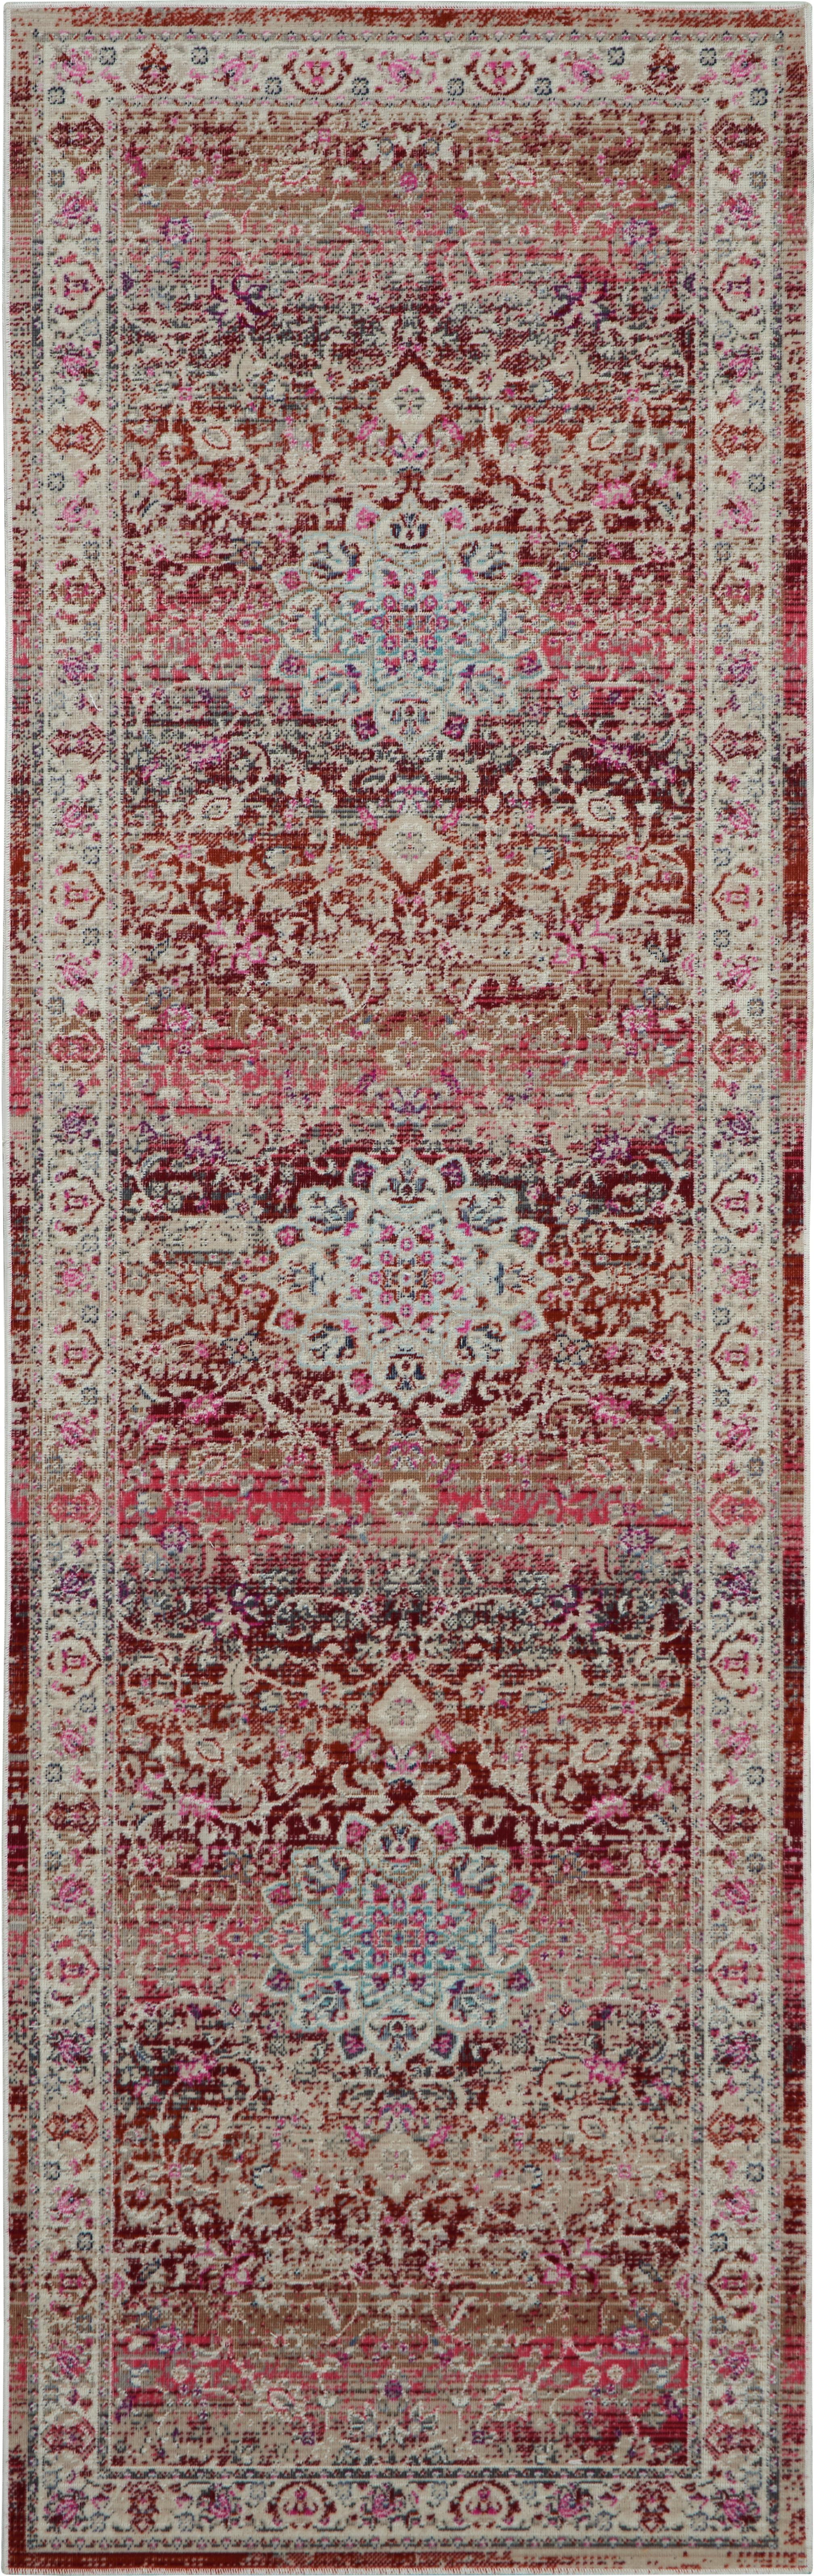 Passatoia a pelo corto Kashan Age, Retro: Latex, Beige, tonalità rosse, Larg. 70 x Lung. 245 cm